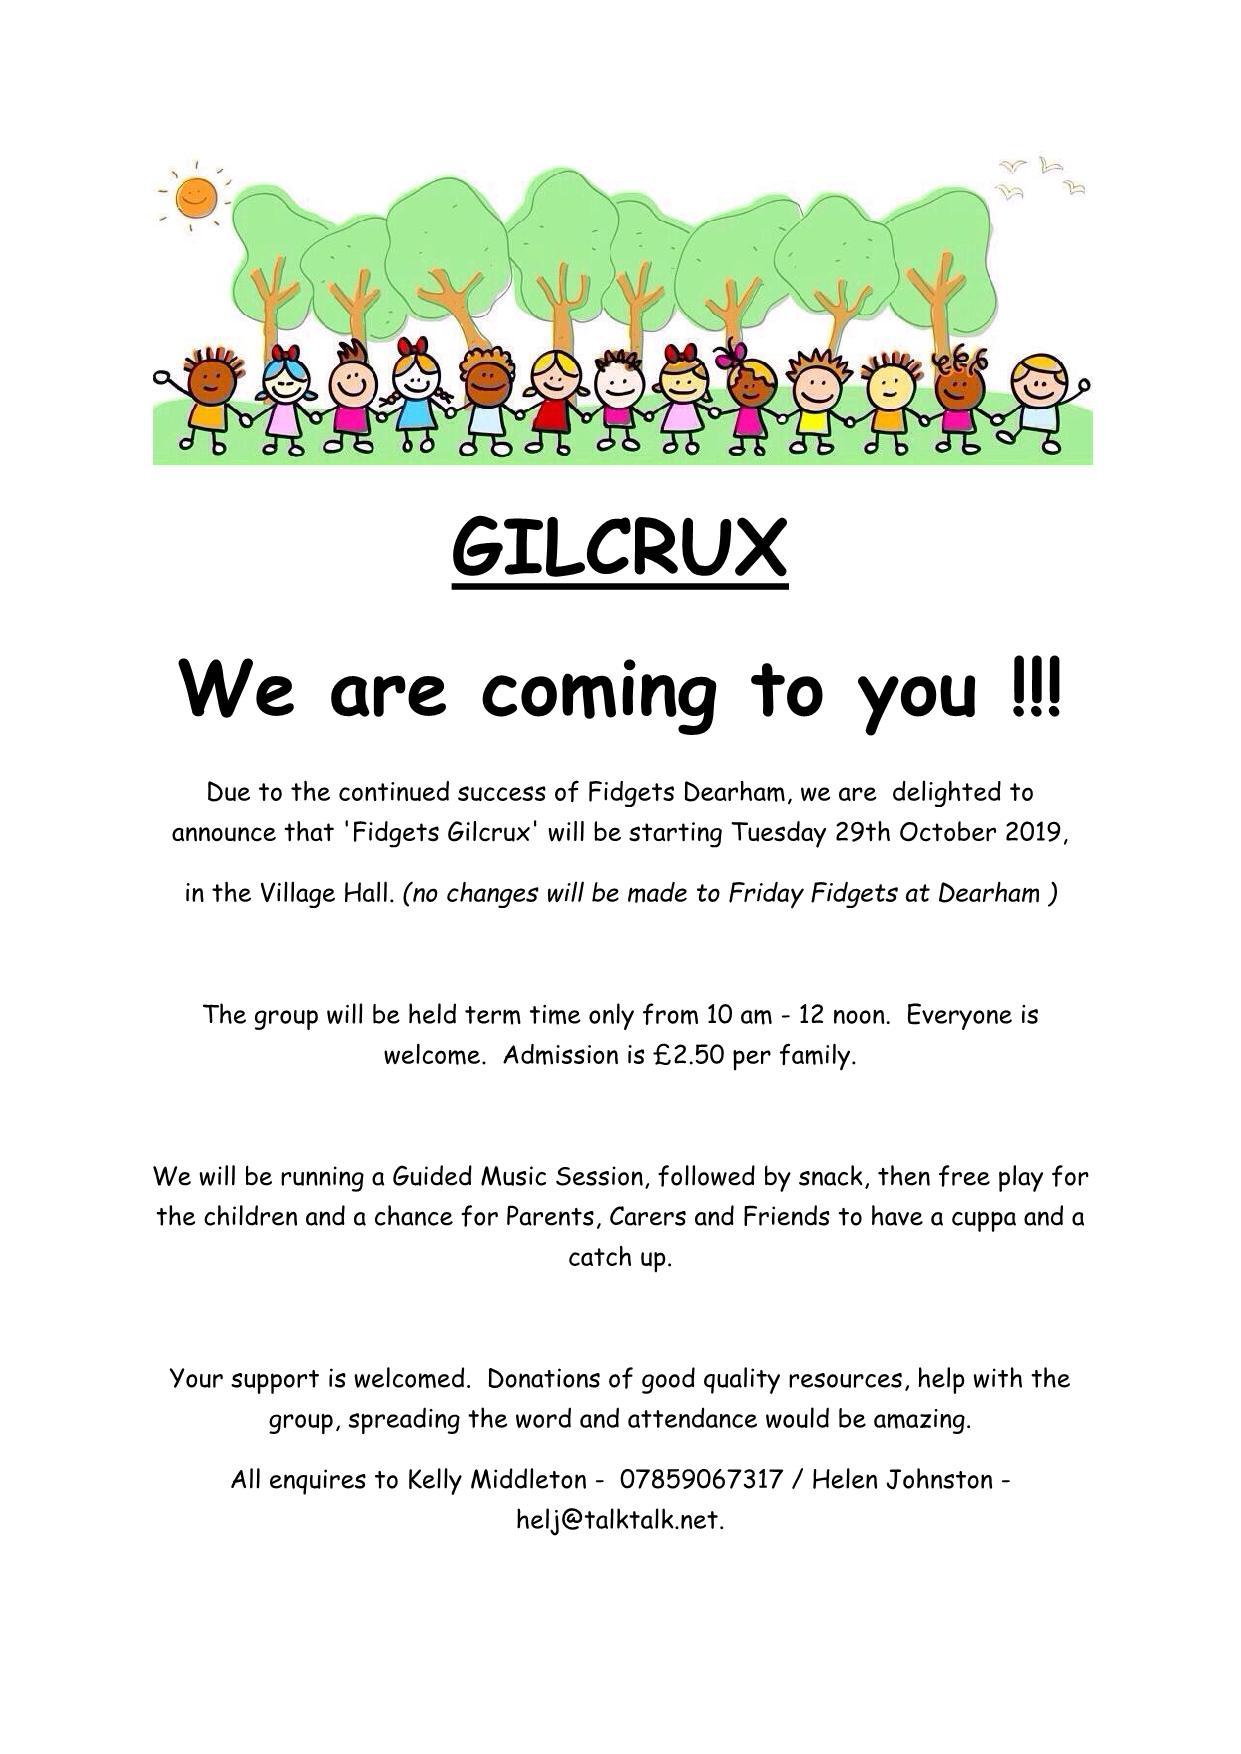 2019 Fidgets Gilcrux